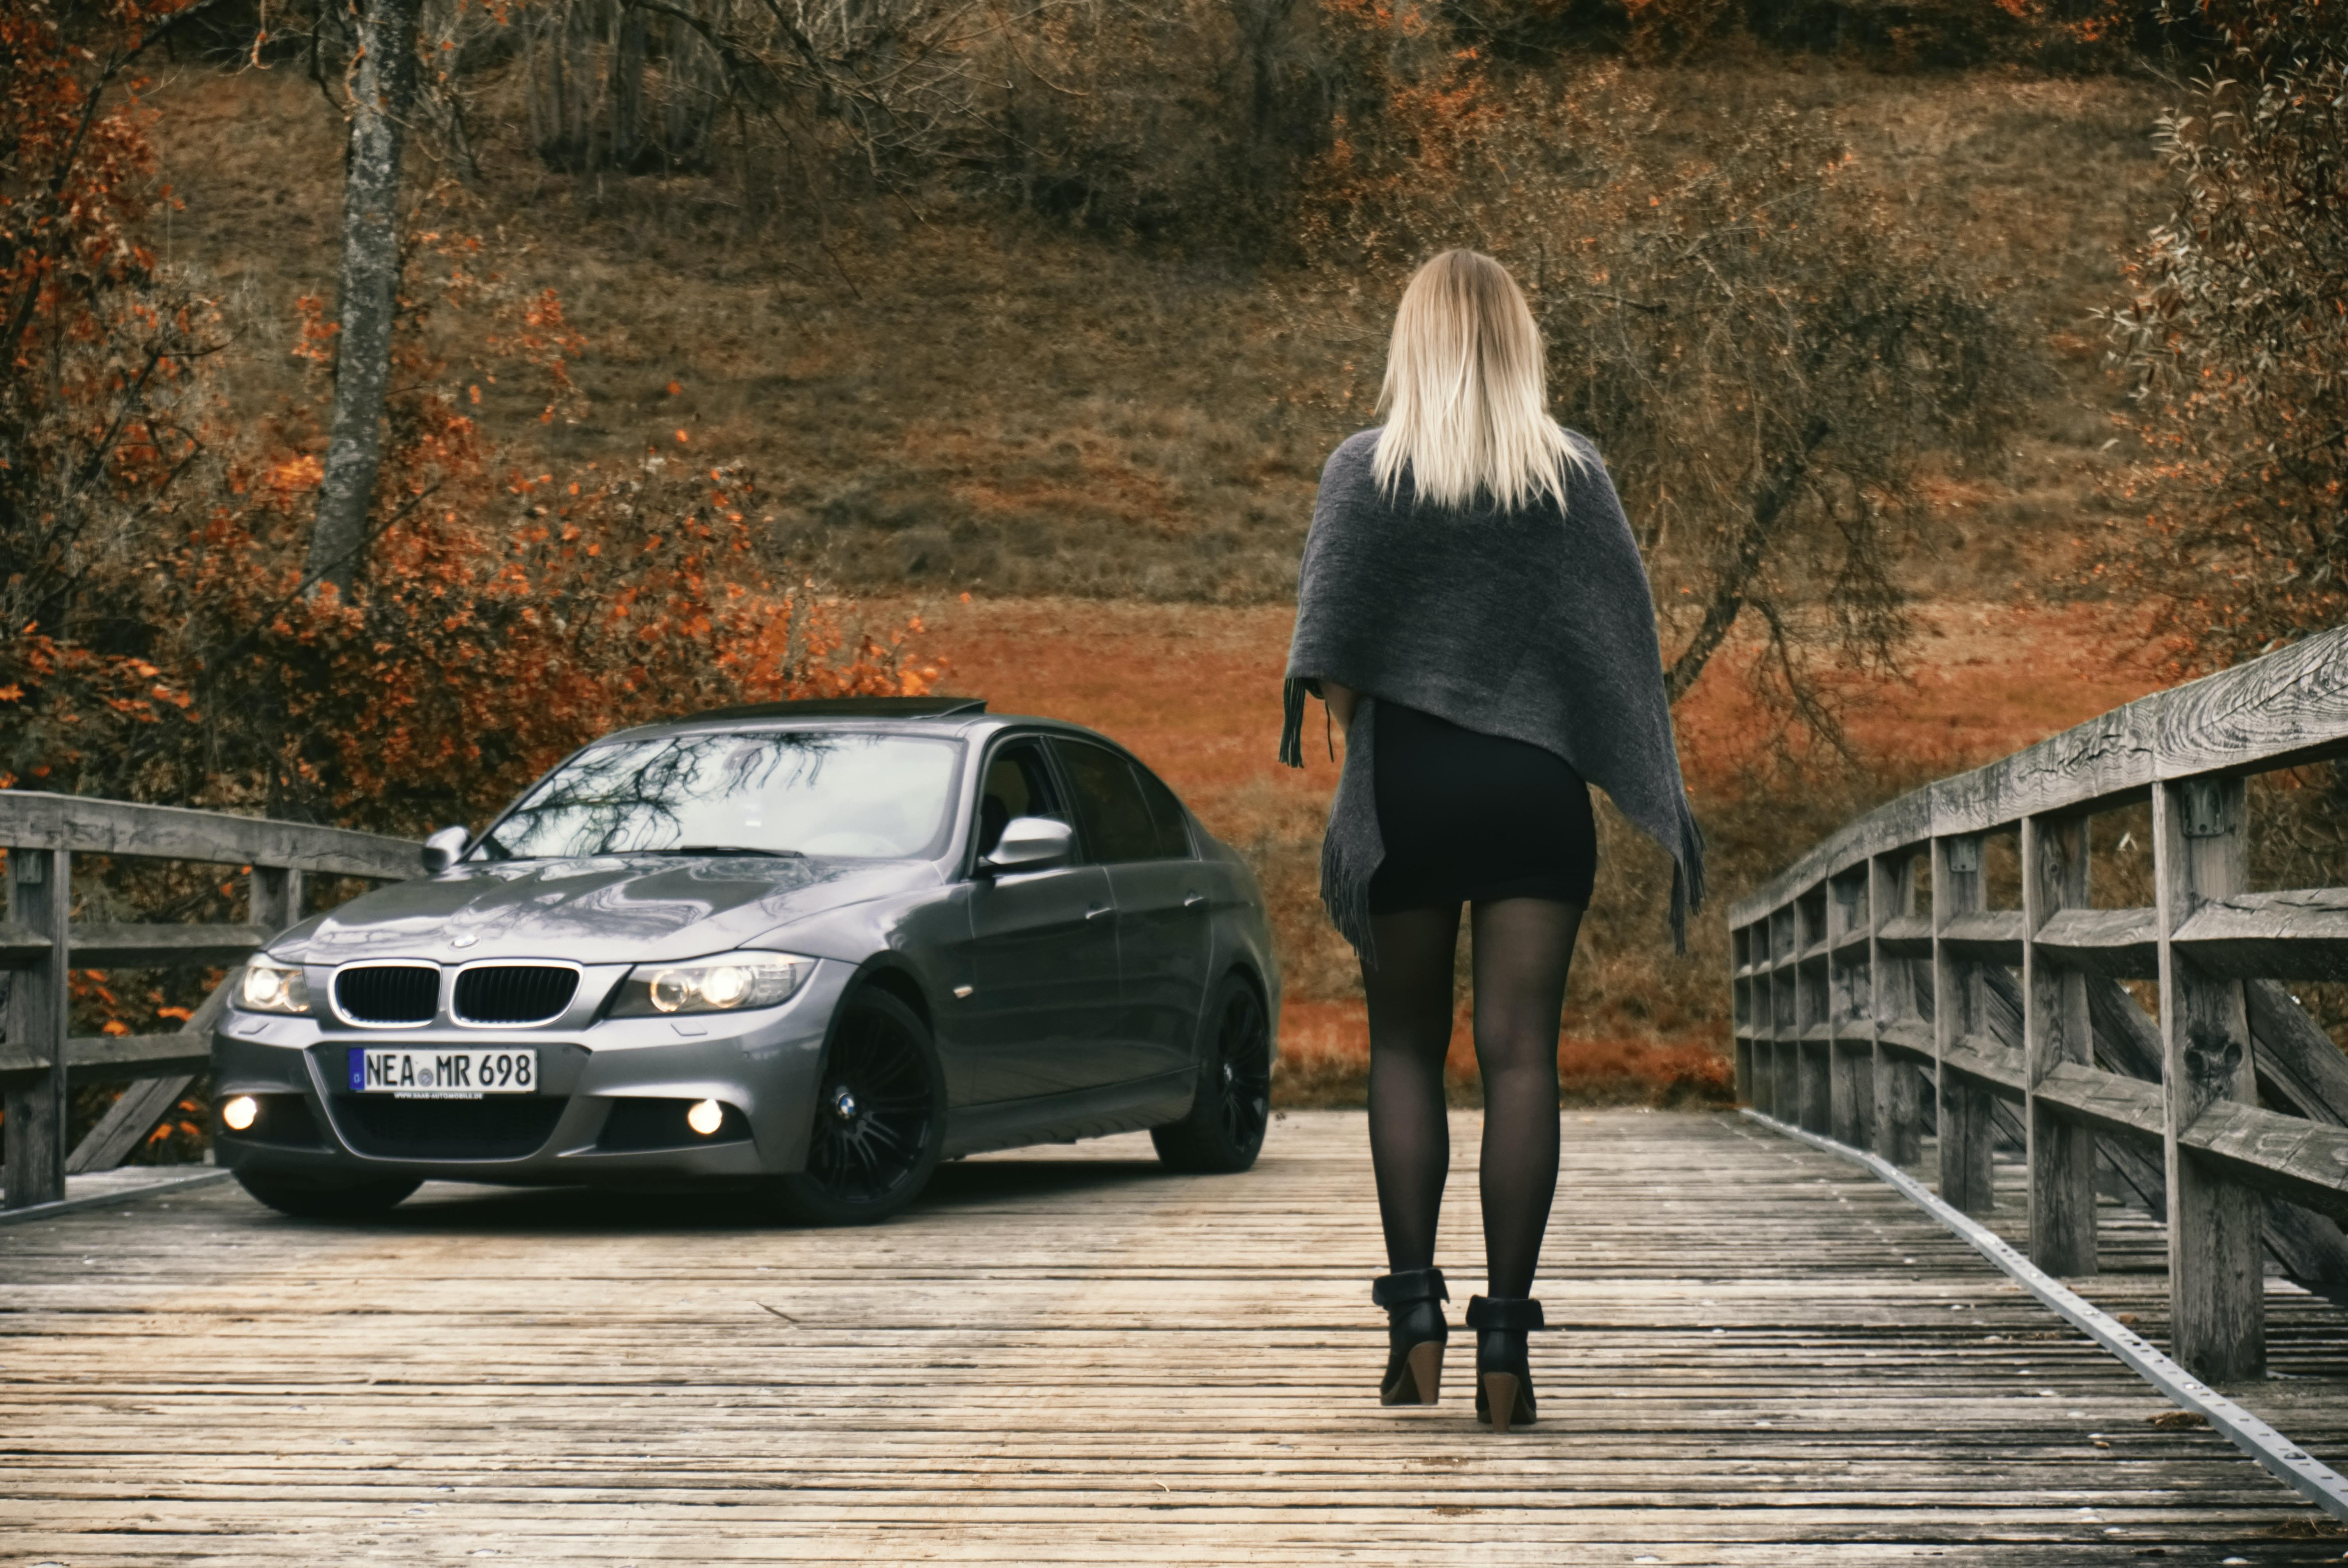 woman walking through gray BMW car at the bridge